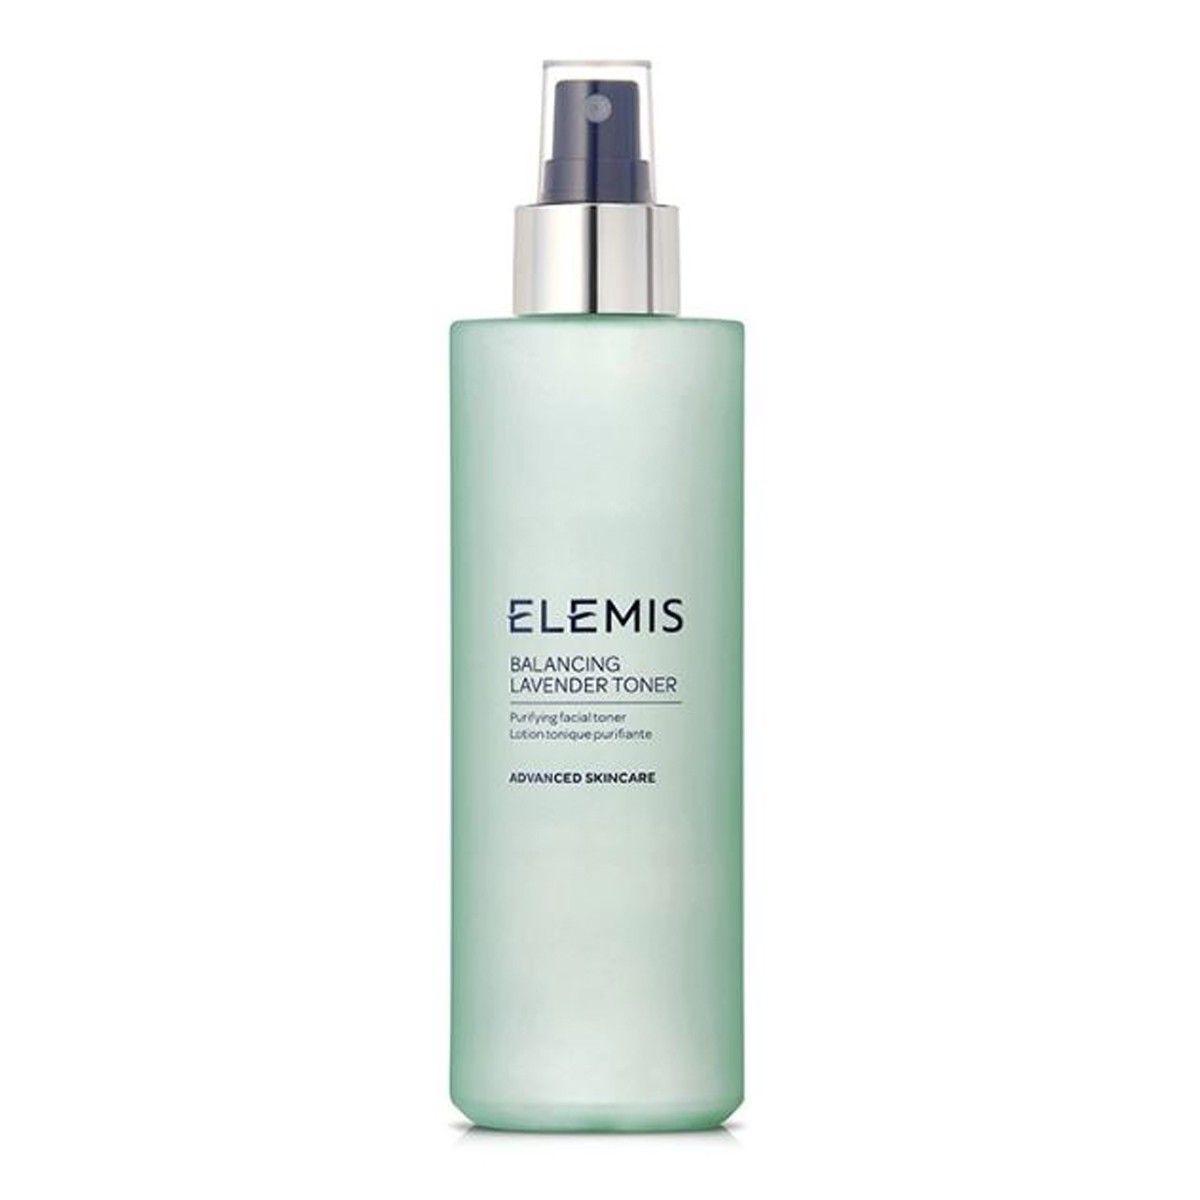 Afbeelding van Elemis Balancing Lavender Toner Advanced Skincare Beauty